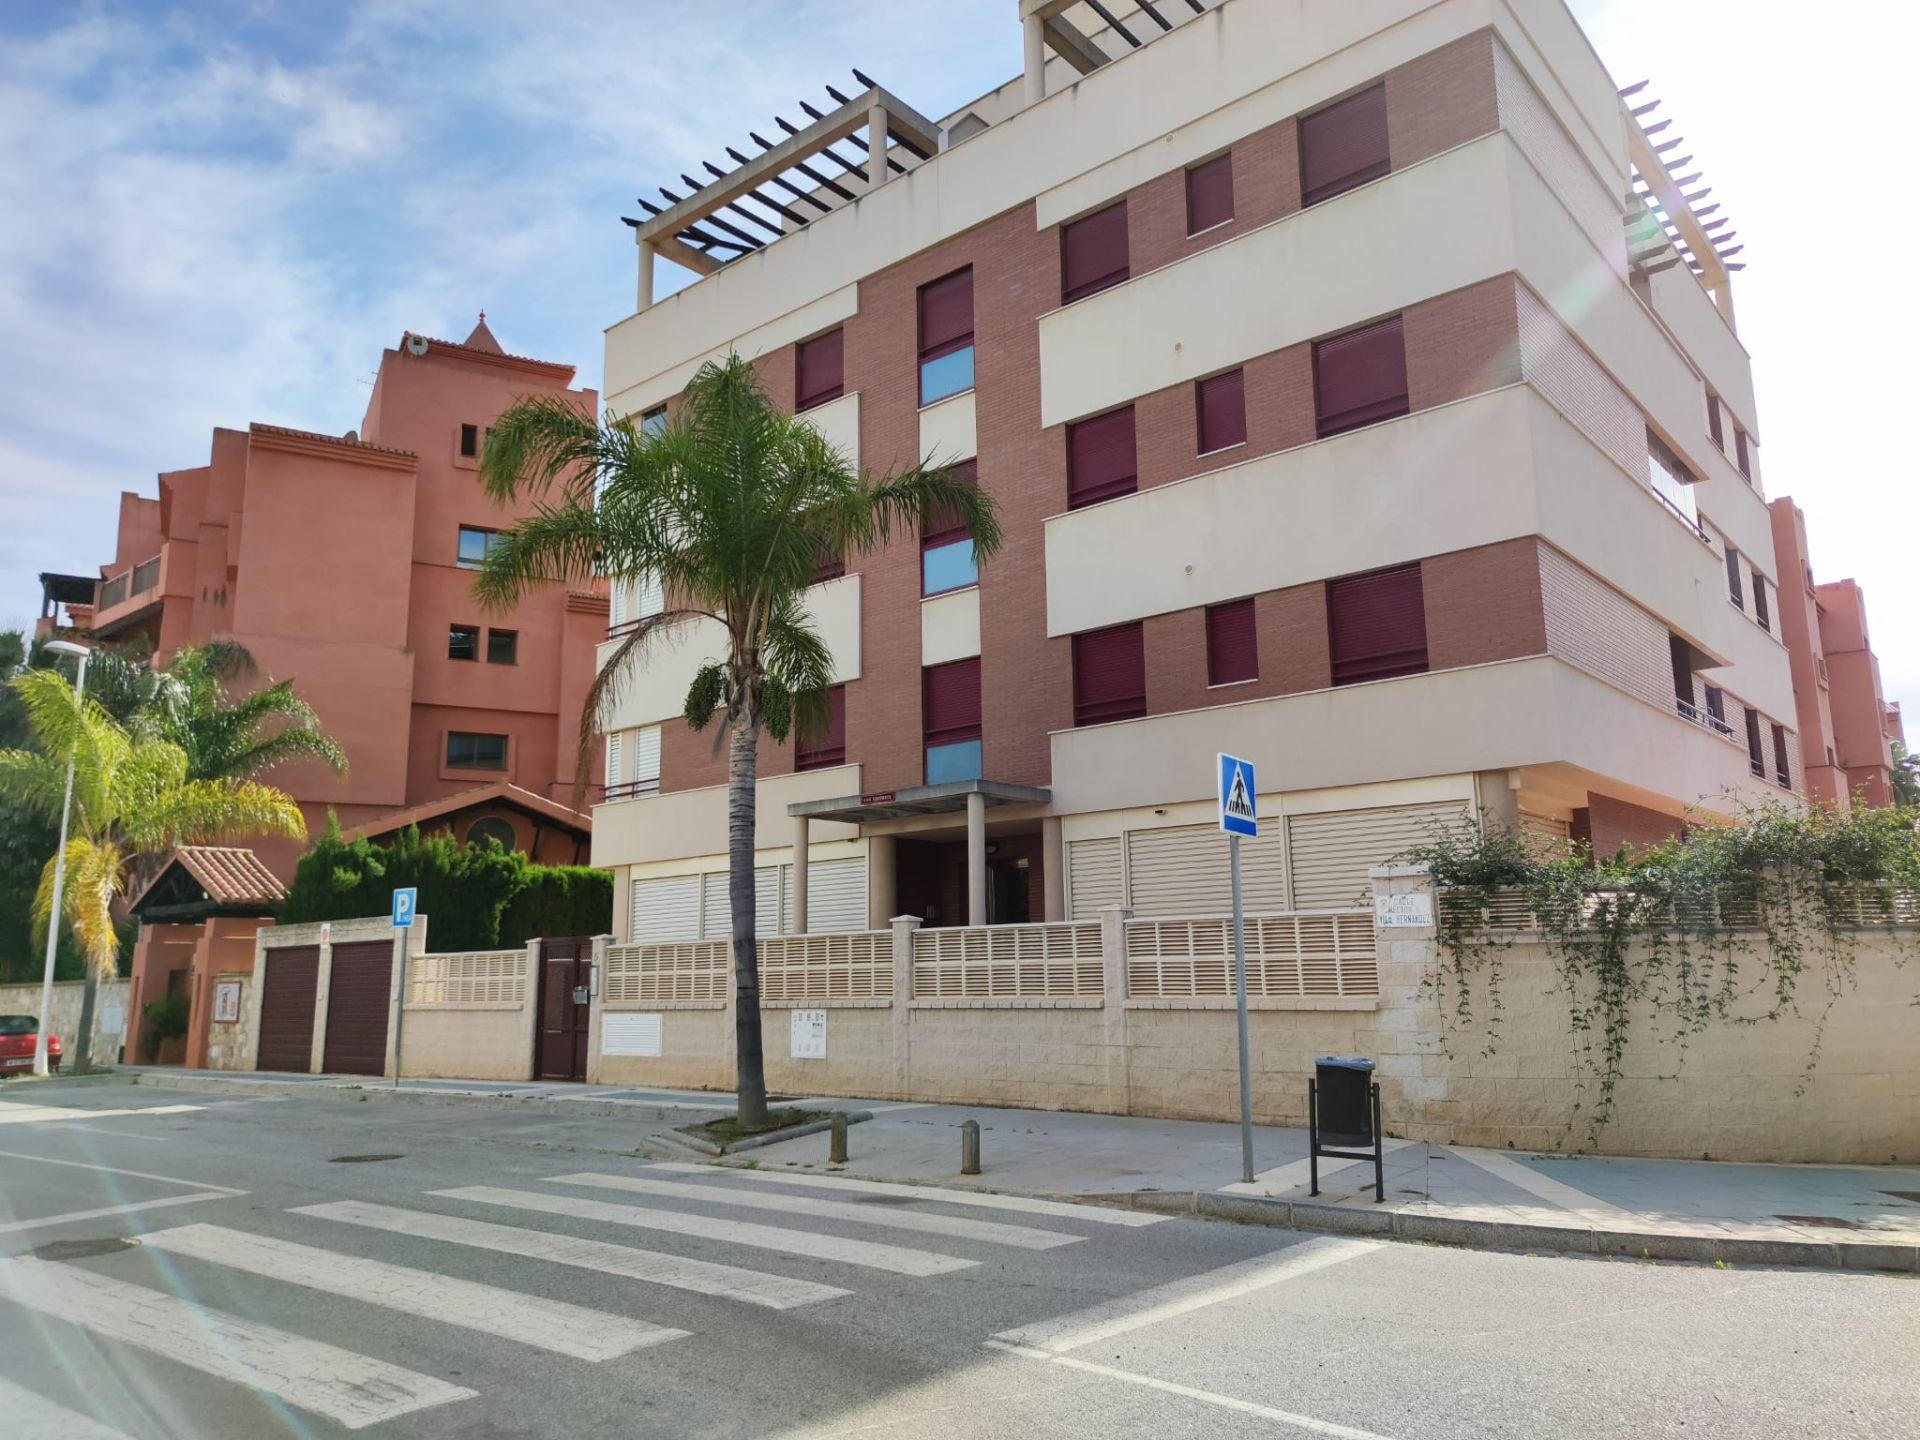 Apartamento en Motril, Motril, alquiler